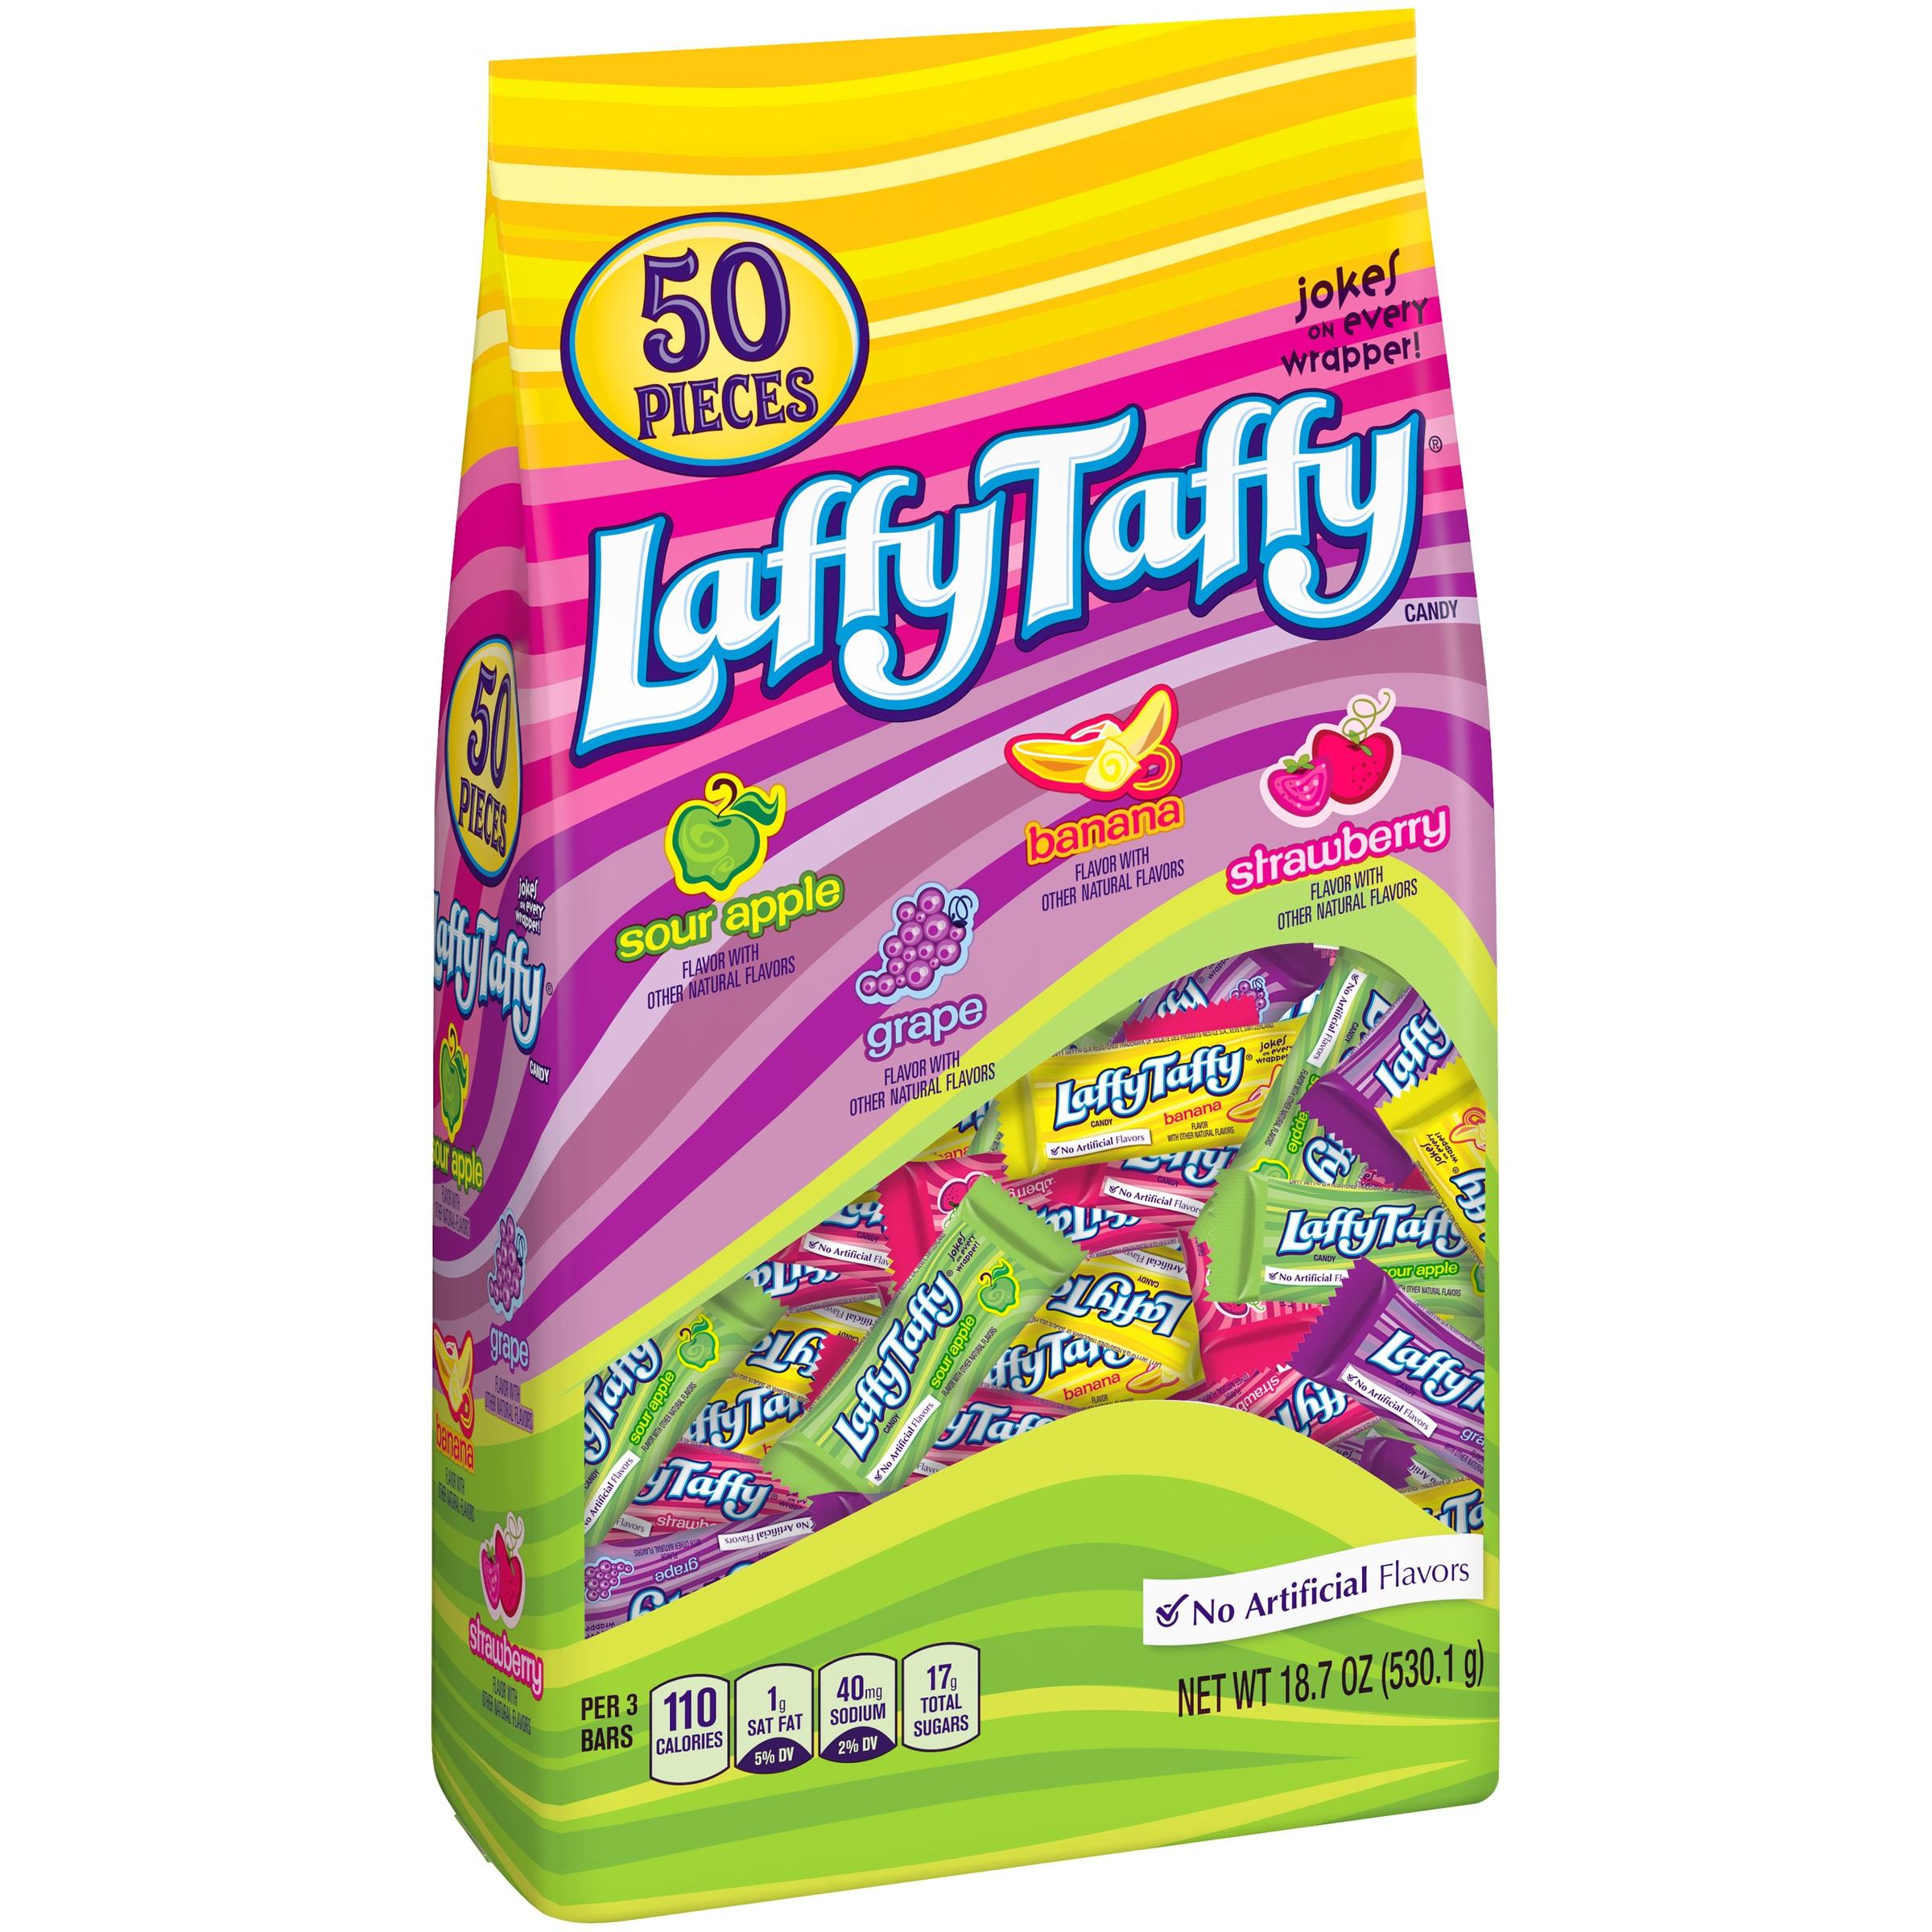 Laffy Taffy Assorted Mini Candy Bars, 18.7 Oz., 50 Count